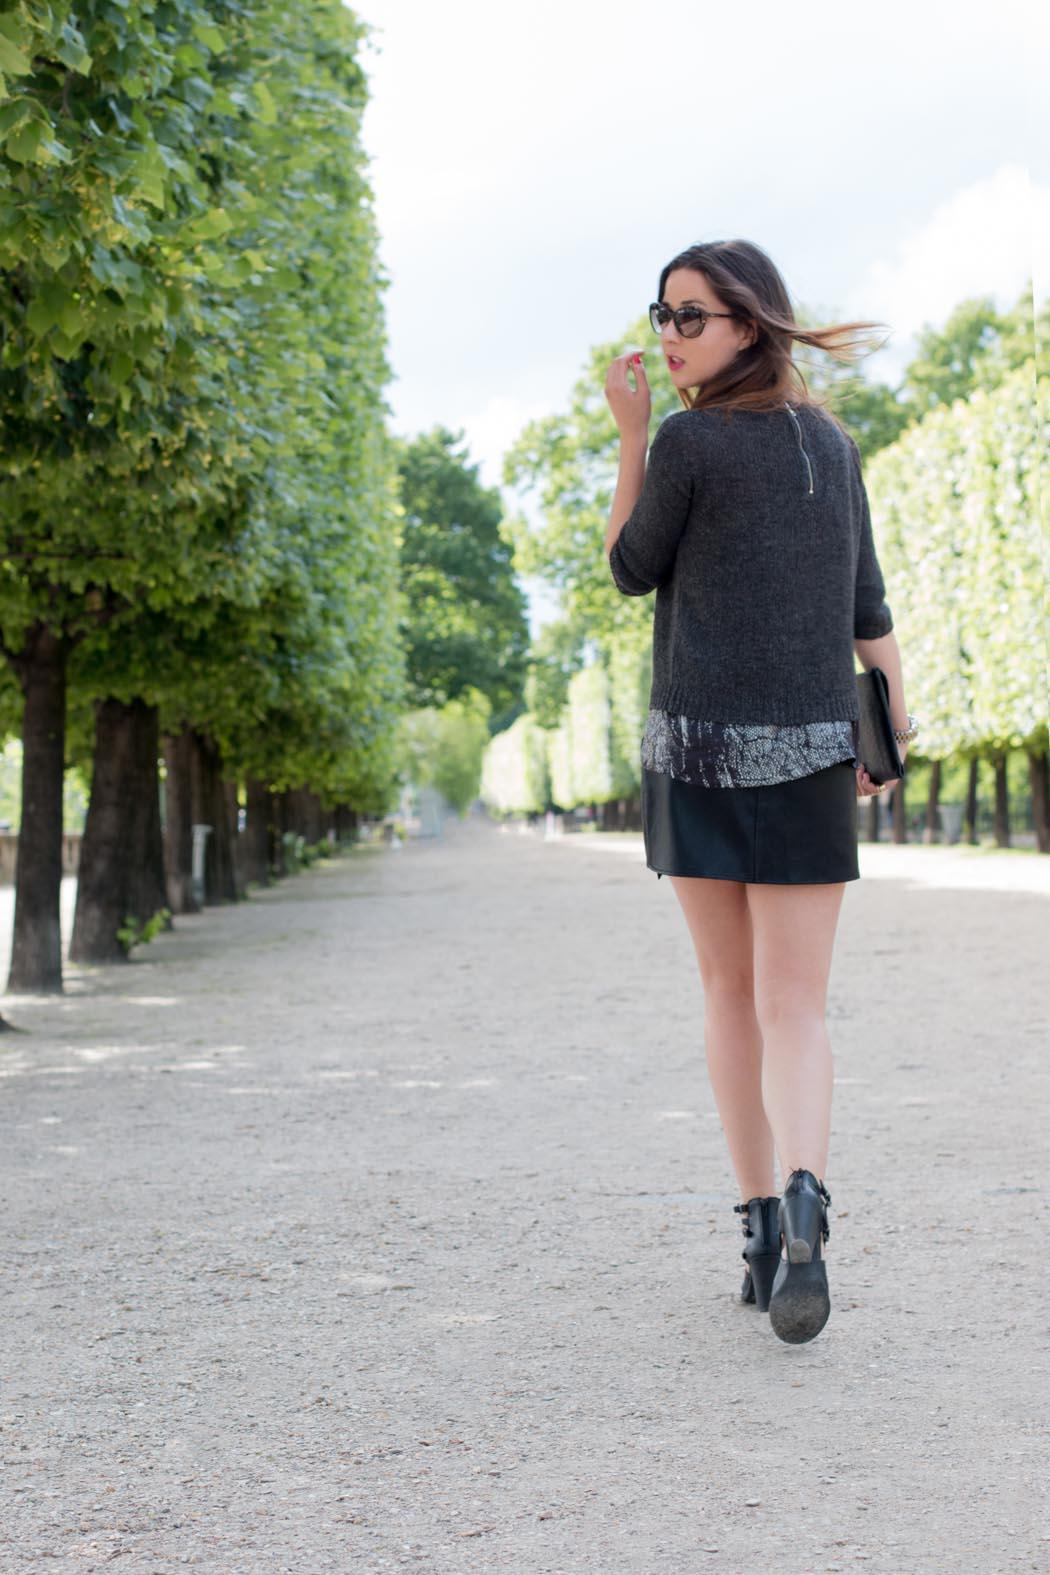 Lindarella-Paris-Fashionblogger-Michael-Kors-Bcbg-allblack